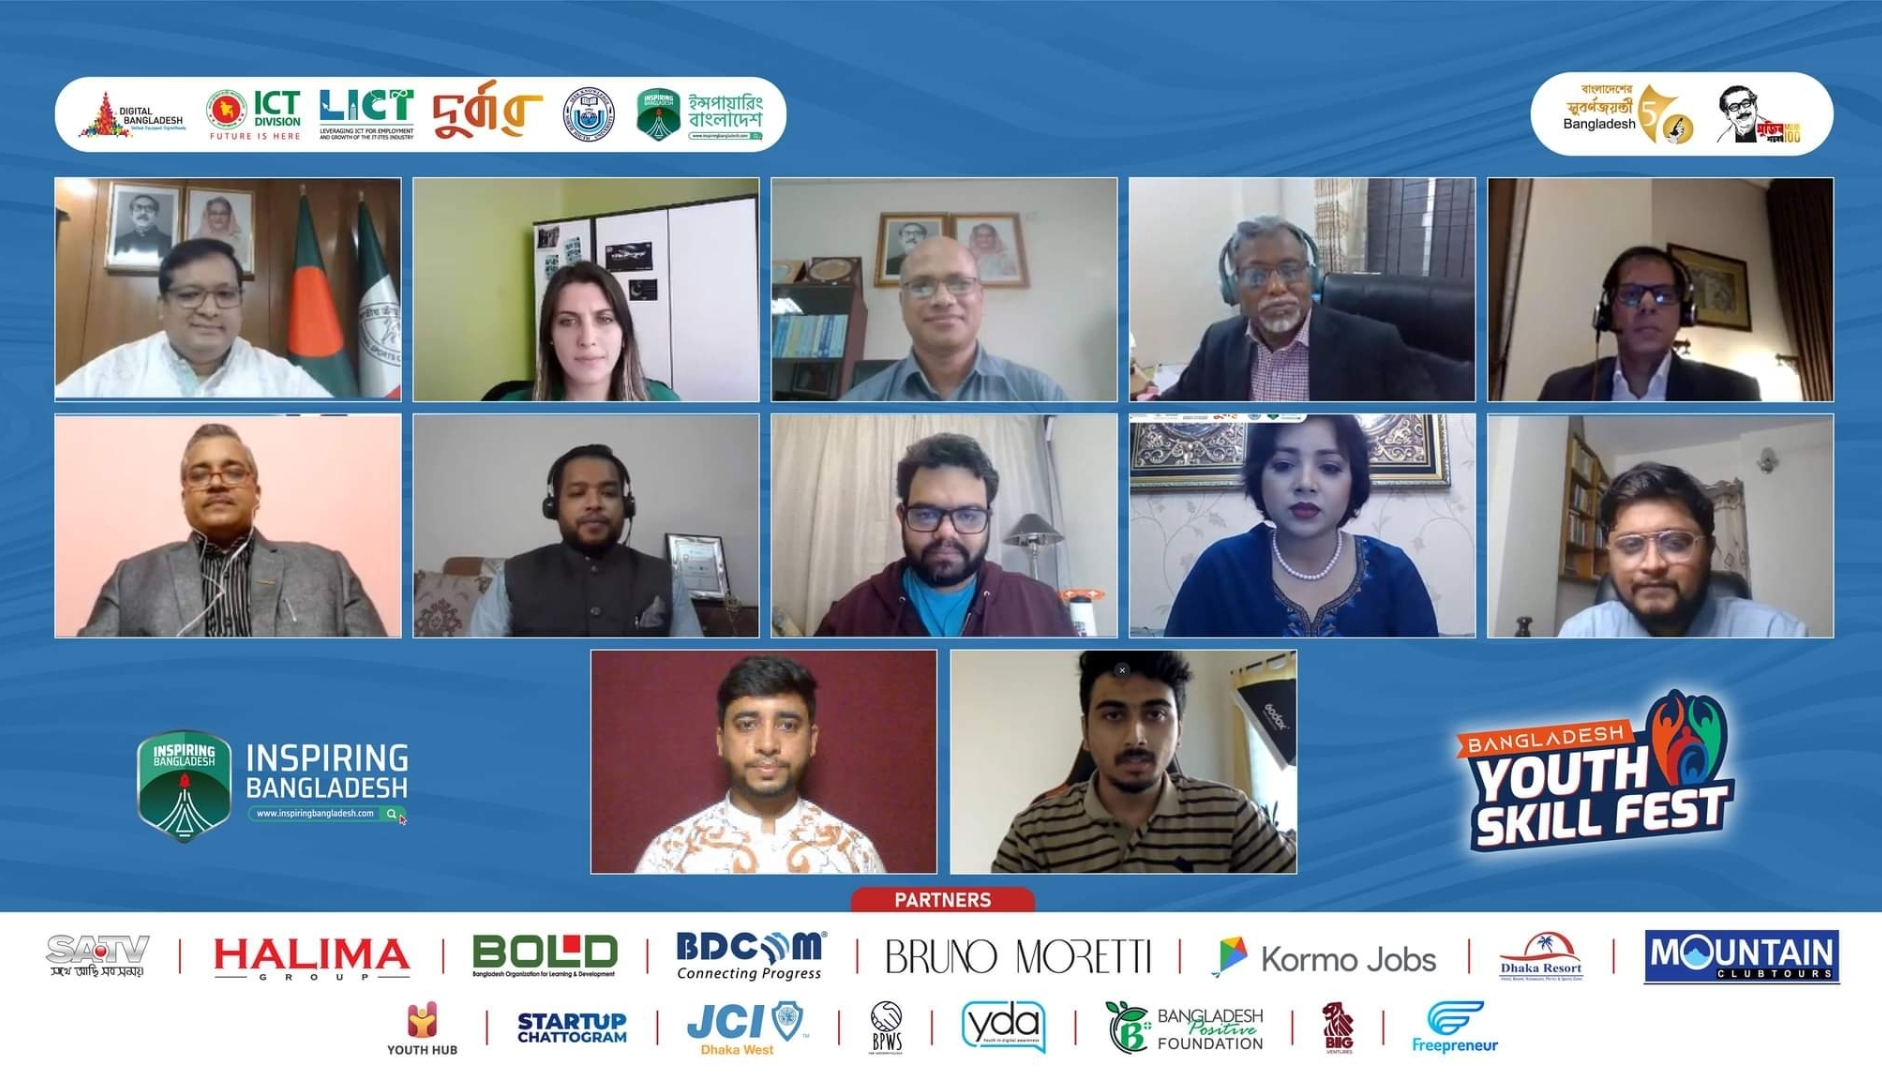 Bangladesh Youth Skills Fest 2021 held